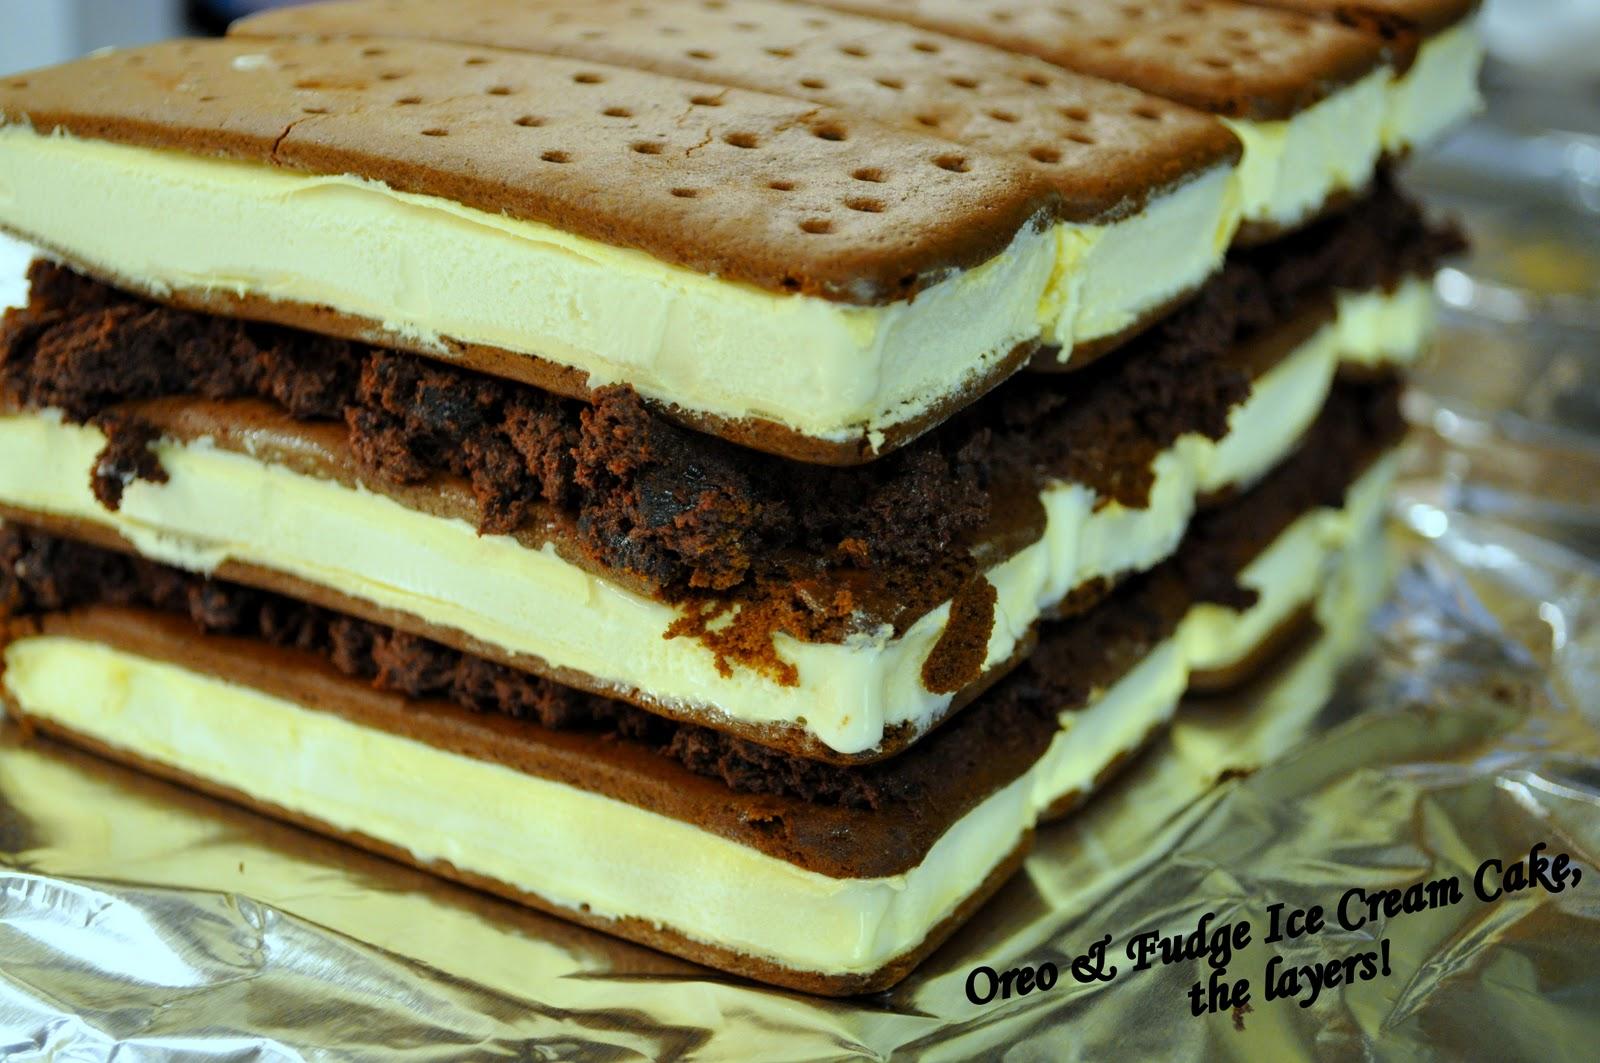 Kraft Canada Ice Cream Sandwich Cake